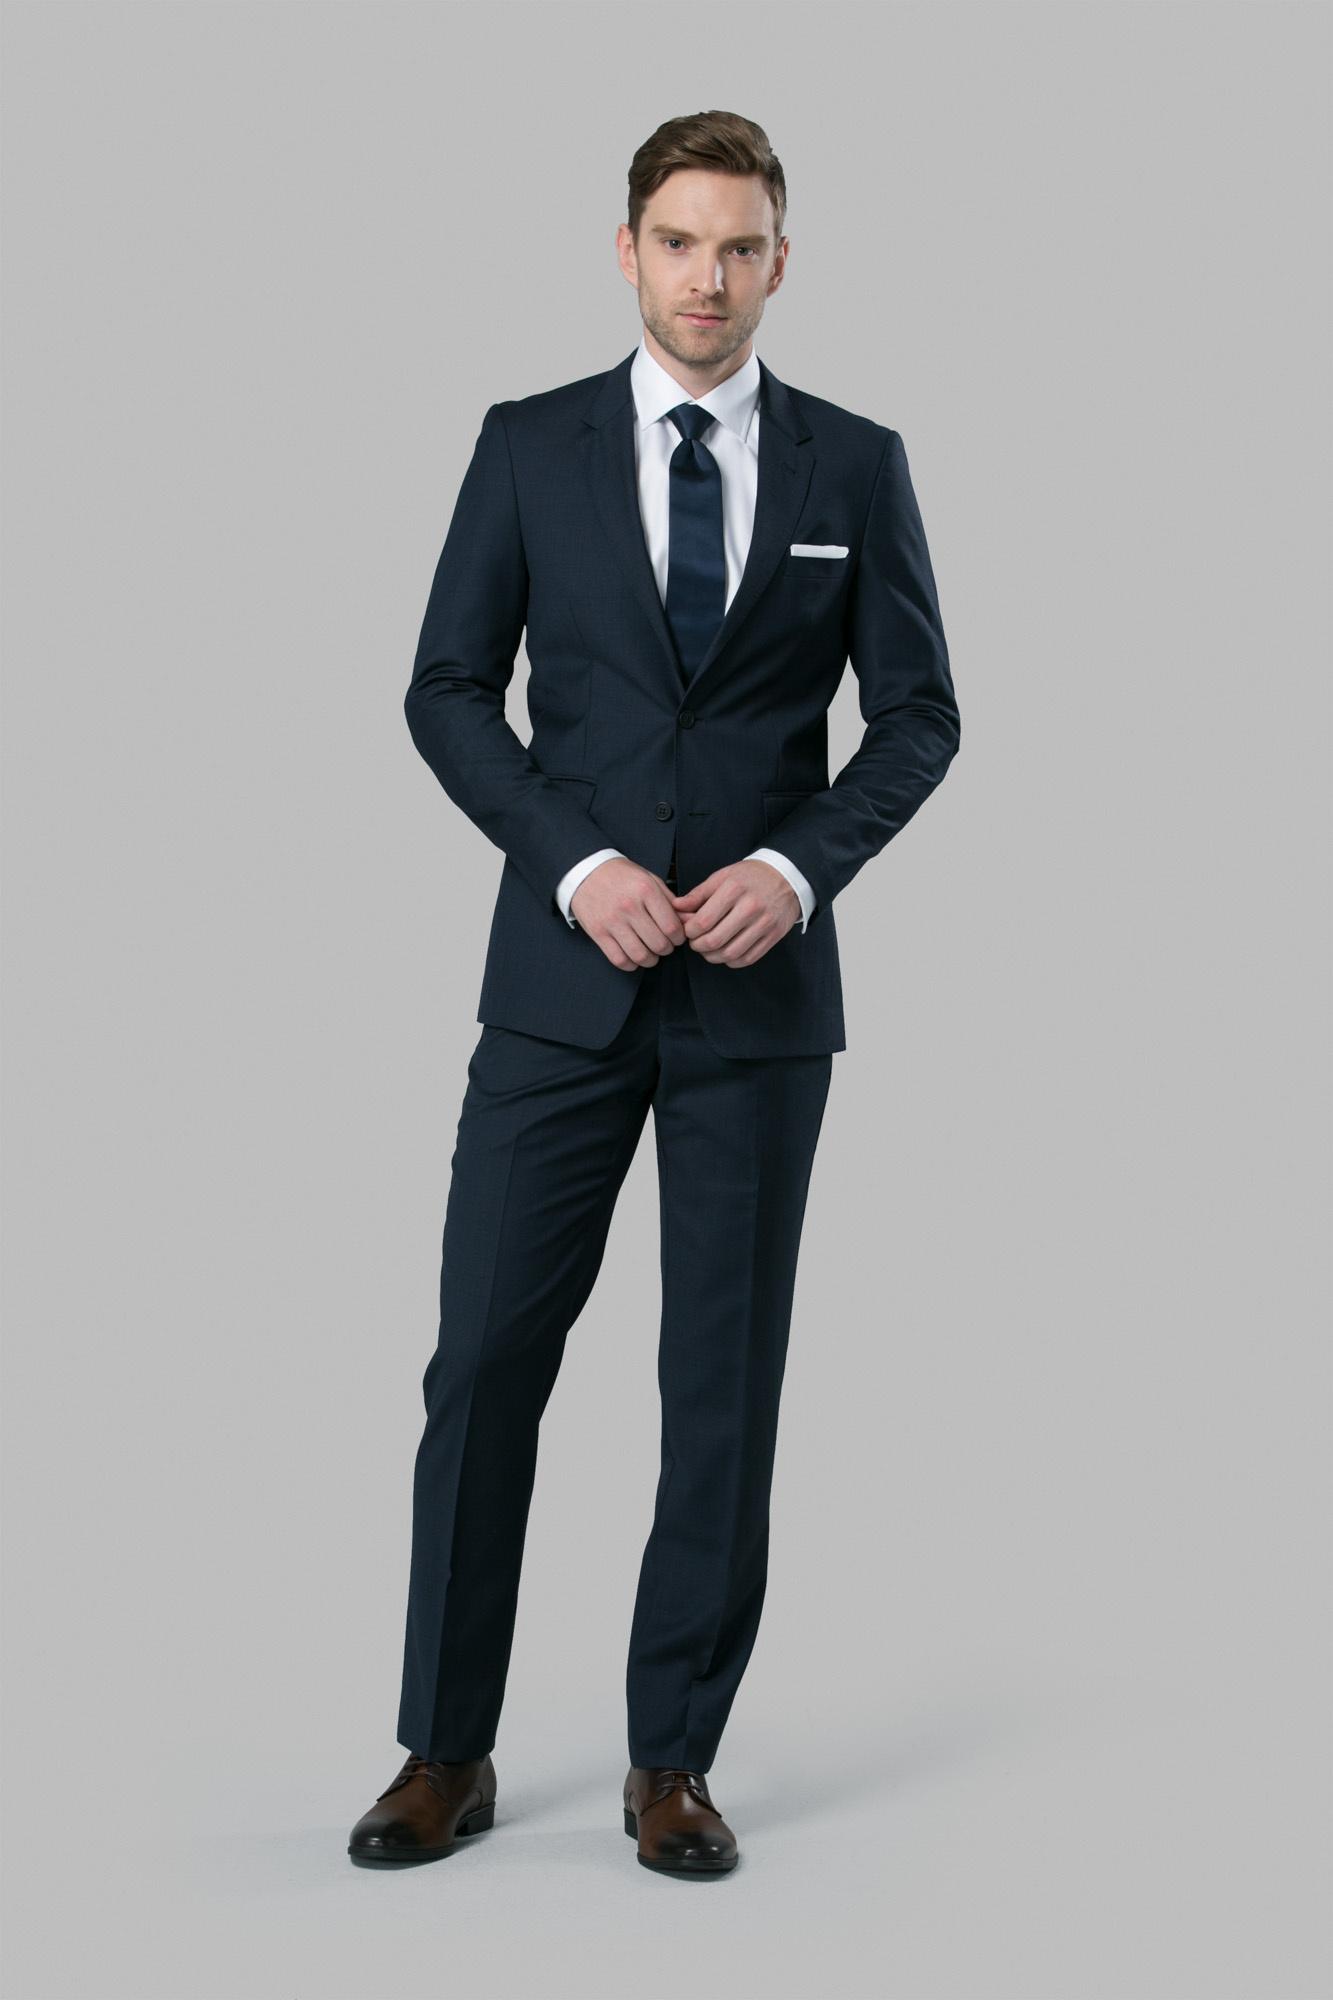 Beautiful Rent Suits For Wedding Sketch - Wedding Dress Ideas ...